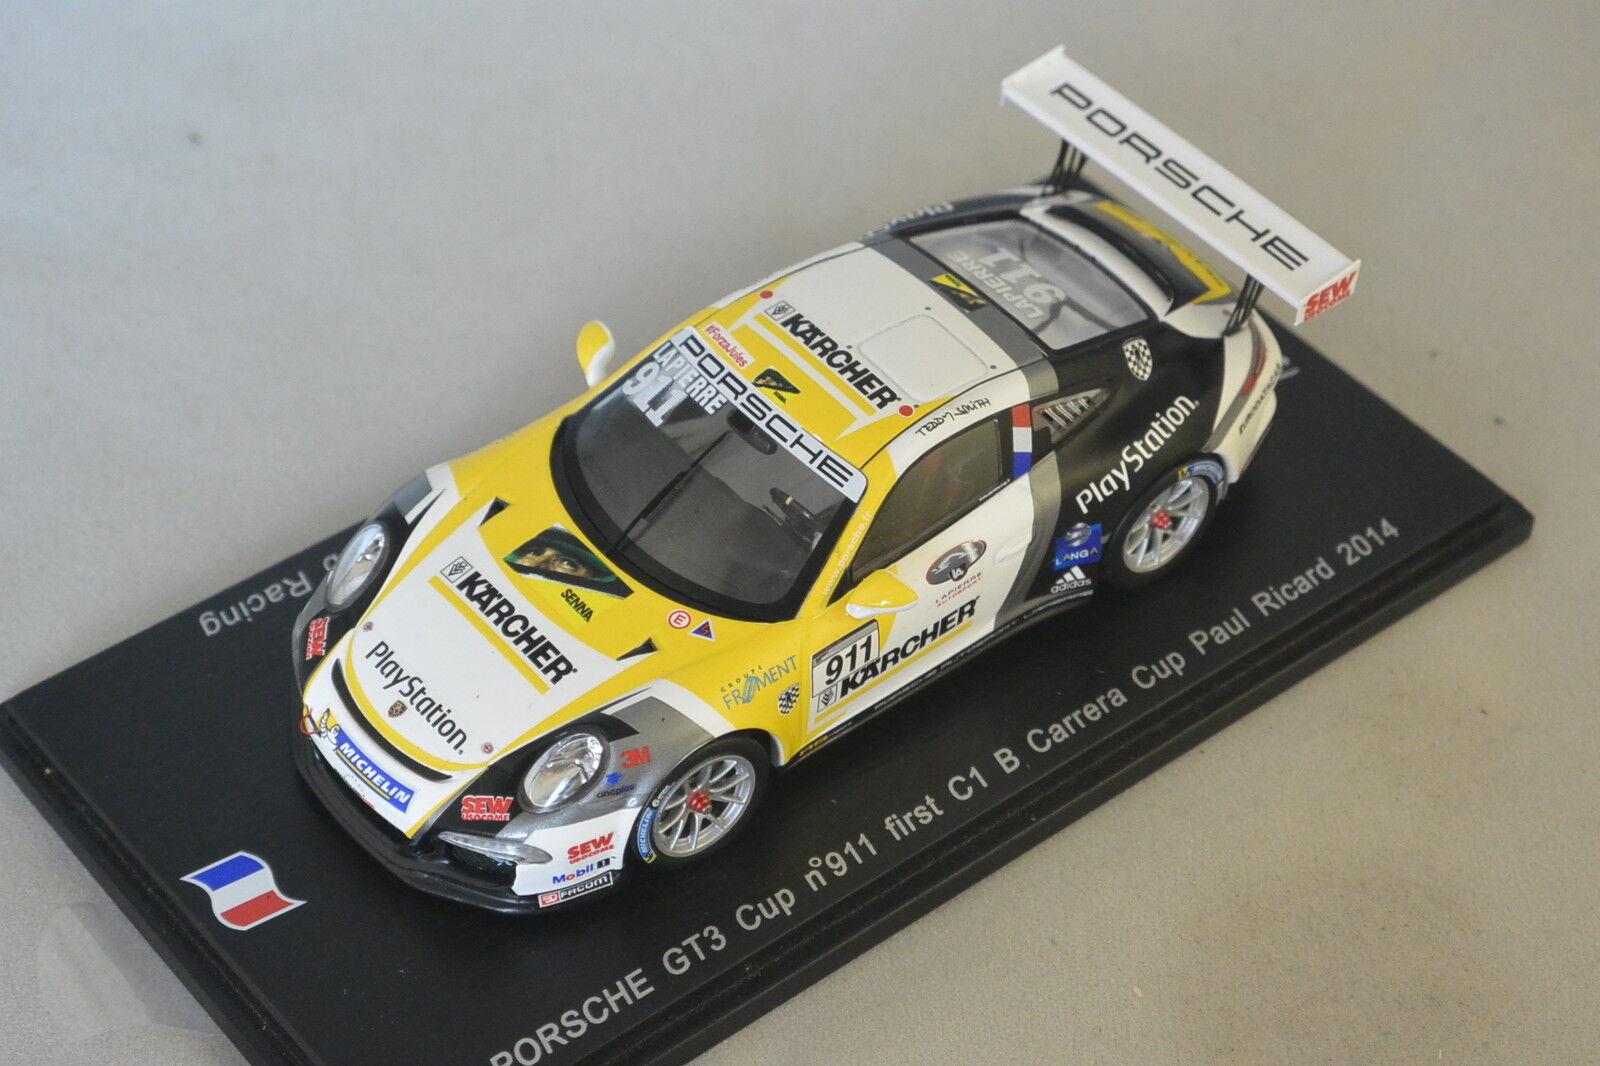 Spark SF083 - PORSCHE GT3 Cup C1 n°911  1er C1 Cup Carrera Cup France B P. Ricard 1 43 9f59ac